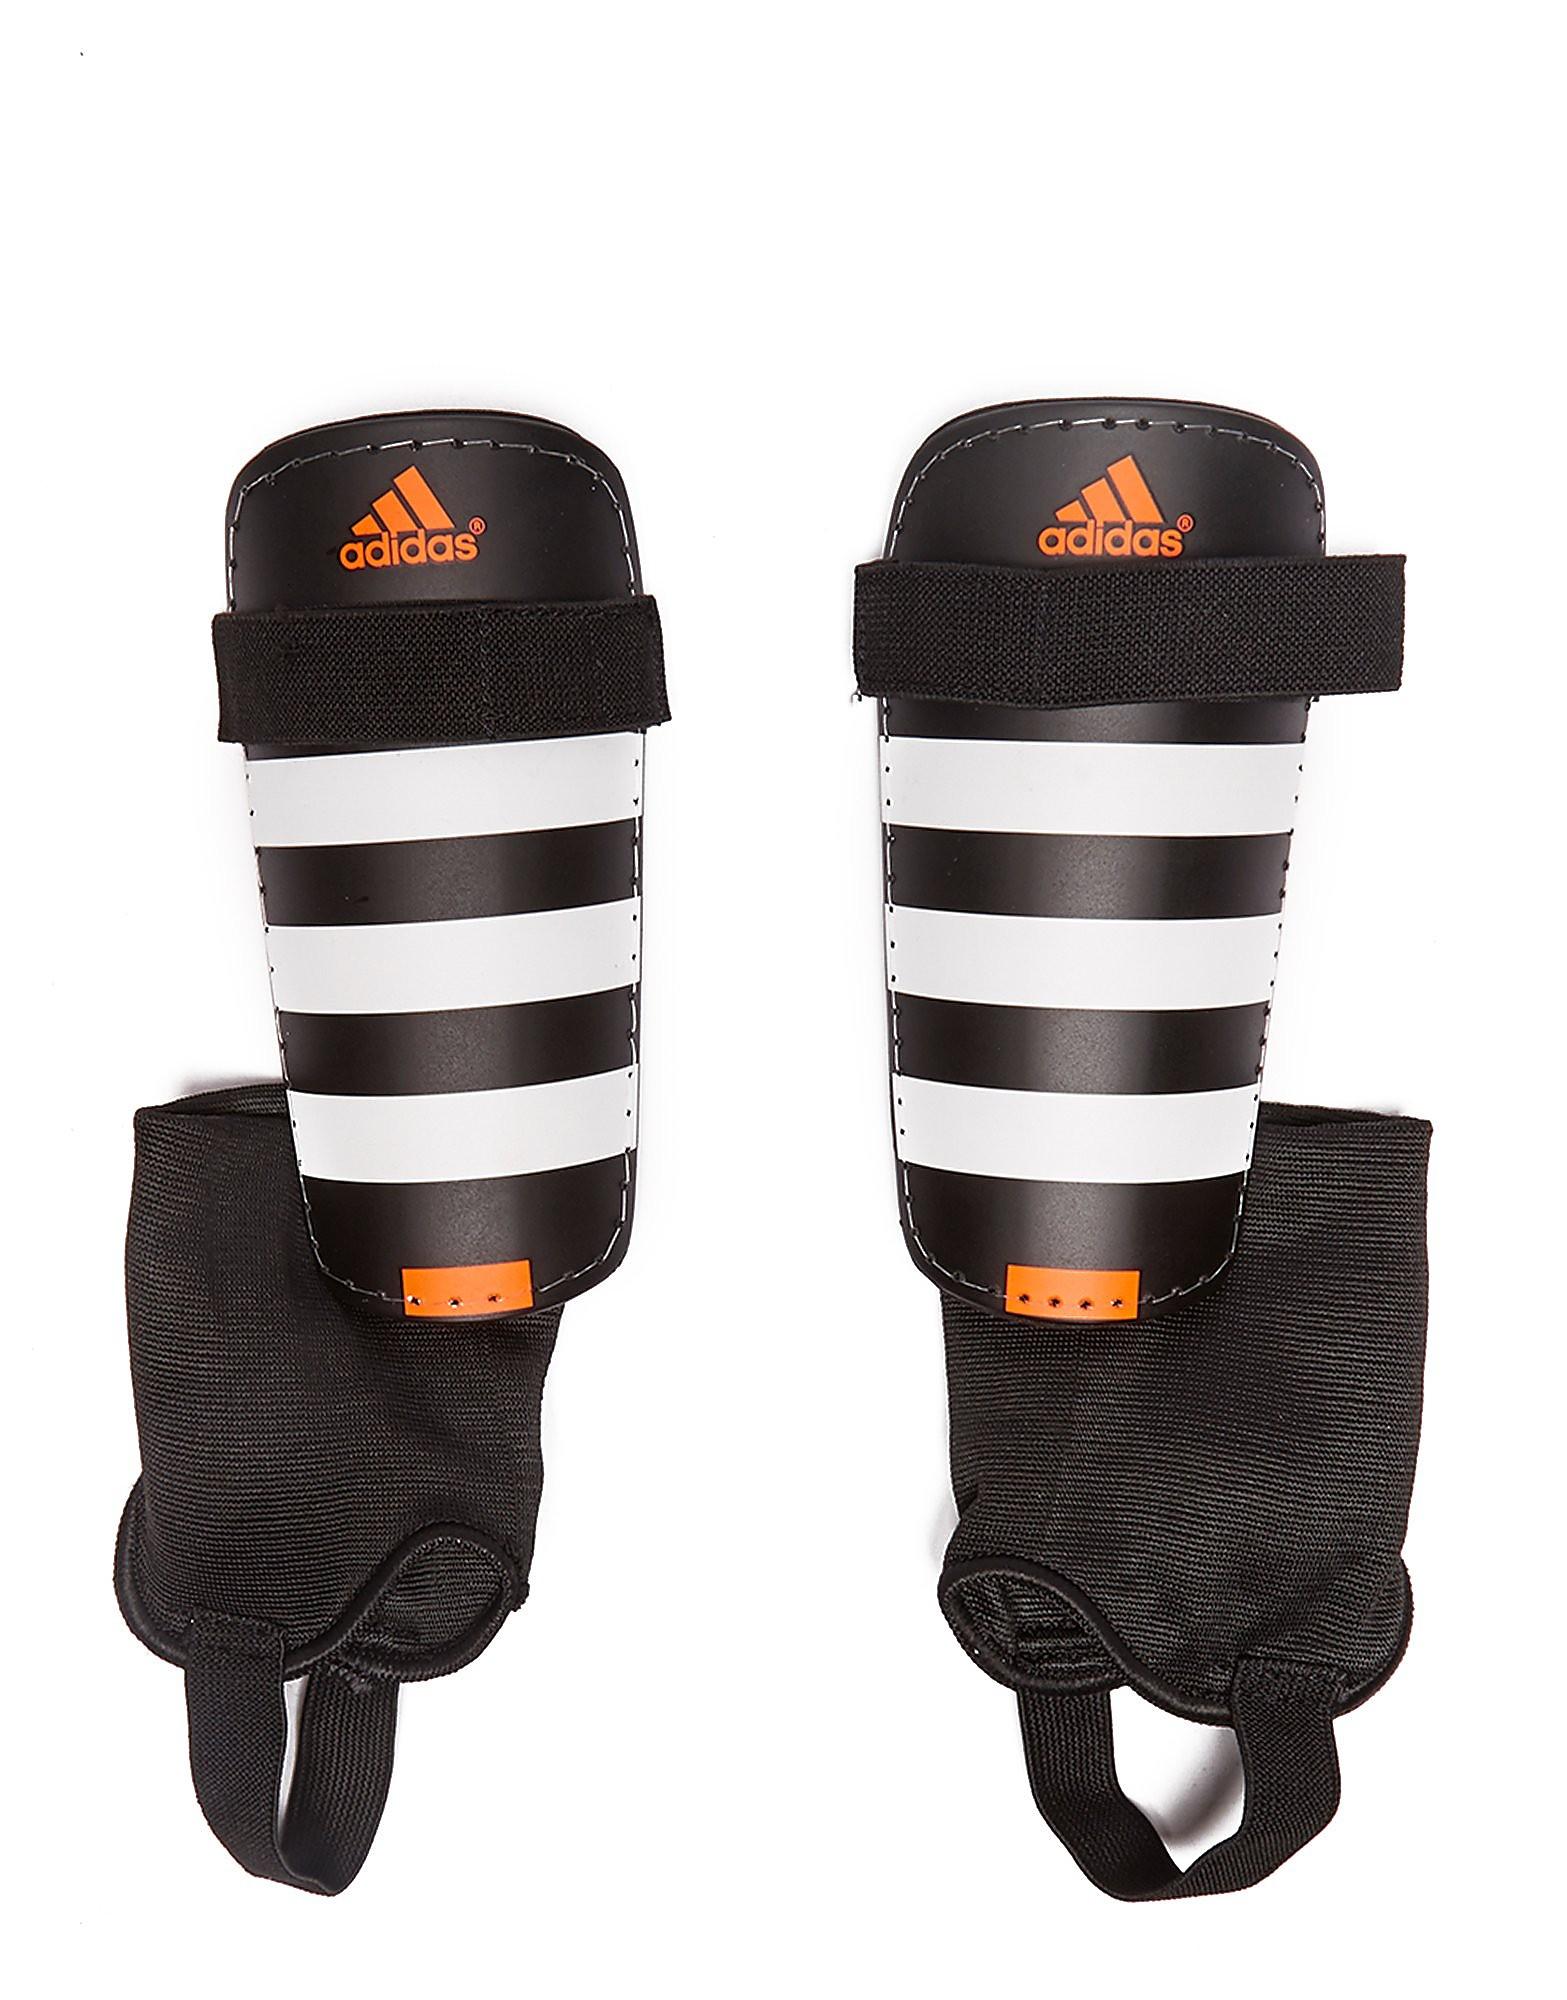 adidas Everclub Shin Guards